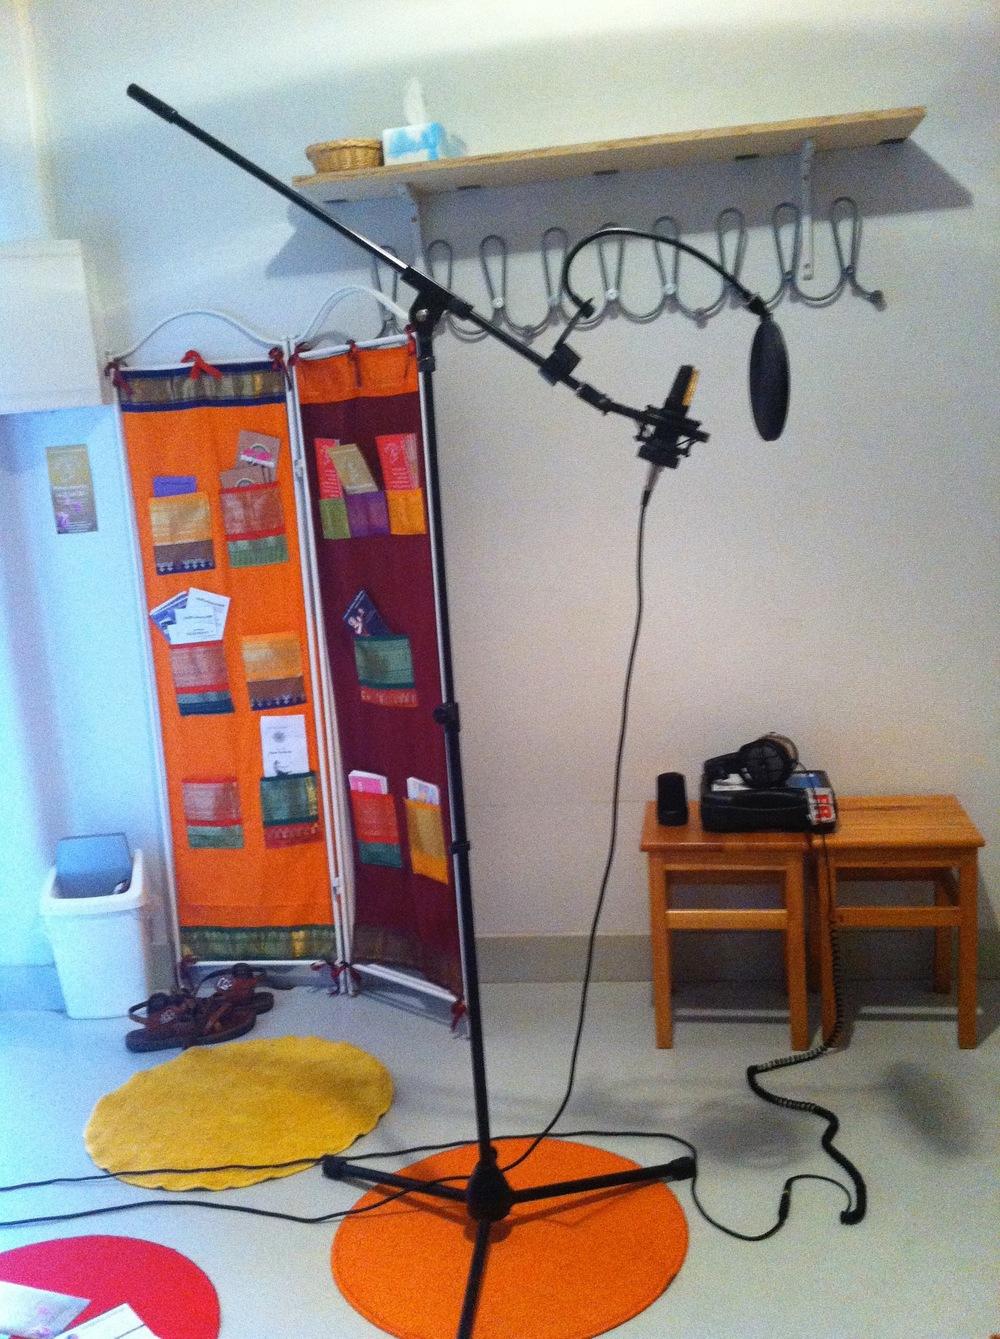 histoire-padma-studio-son-vincent-dorlac.jpg